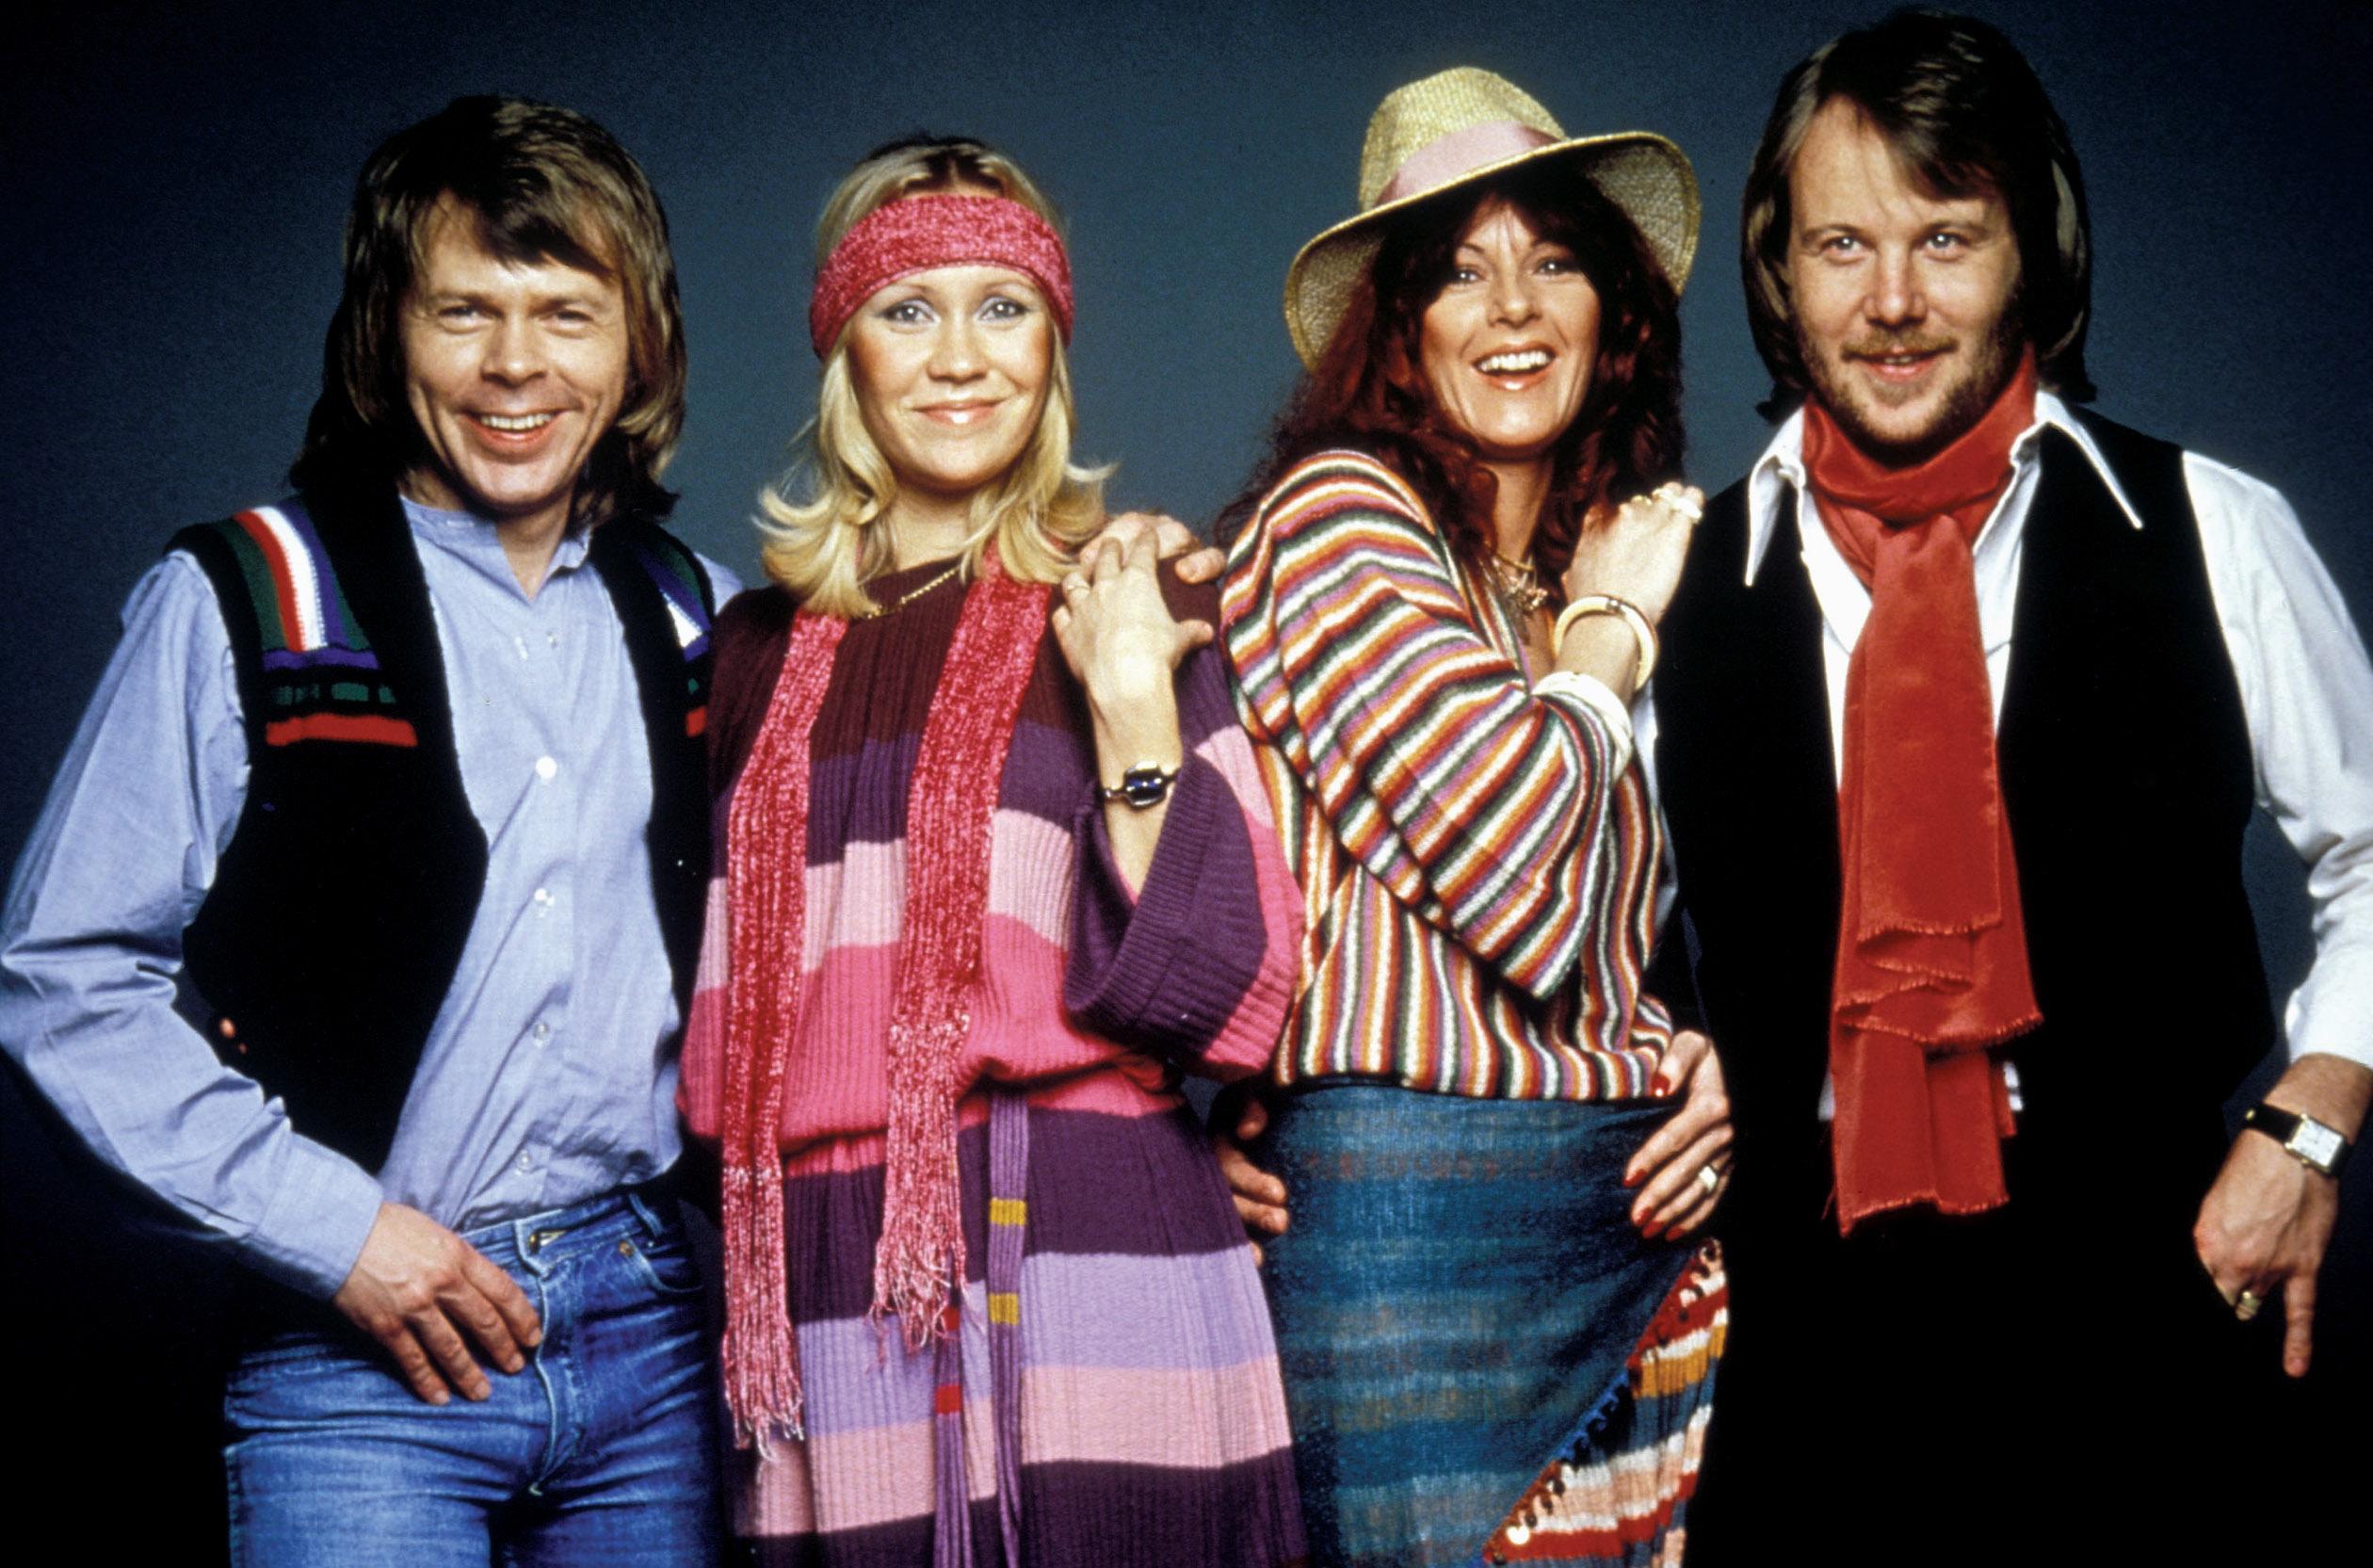 ABBA: THE MOVIE, Bjorn Ulvaeus, Agnetha Faltskog, Anni-Frid Lyngstad, Benny Andersson, 1977